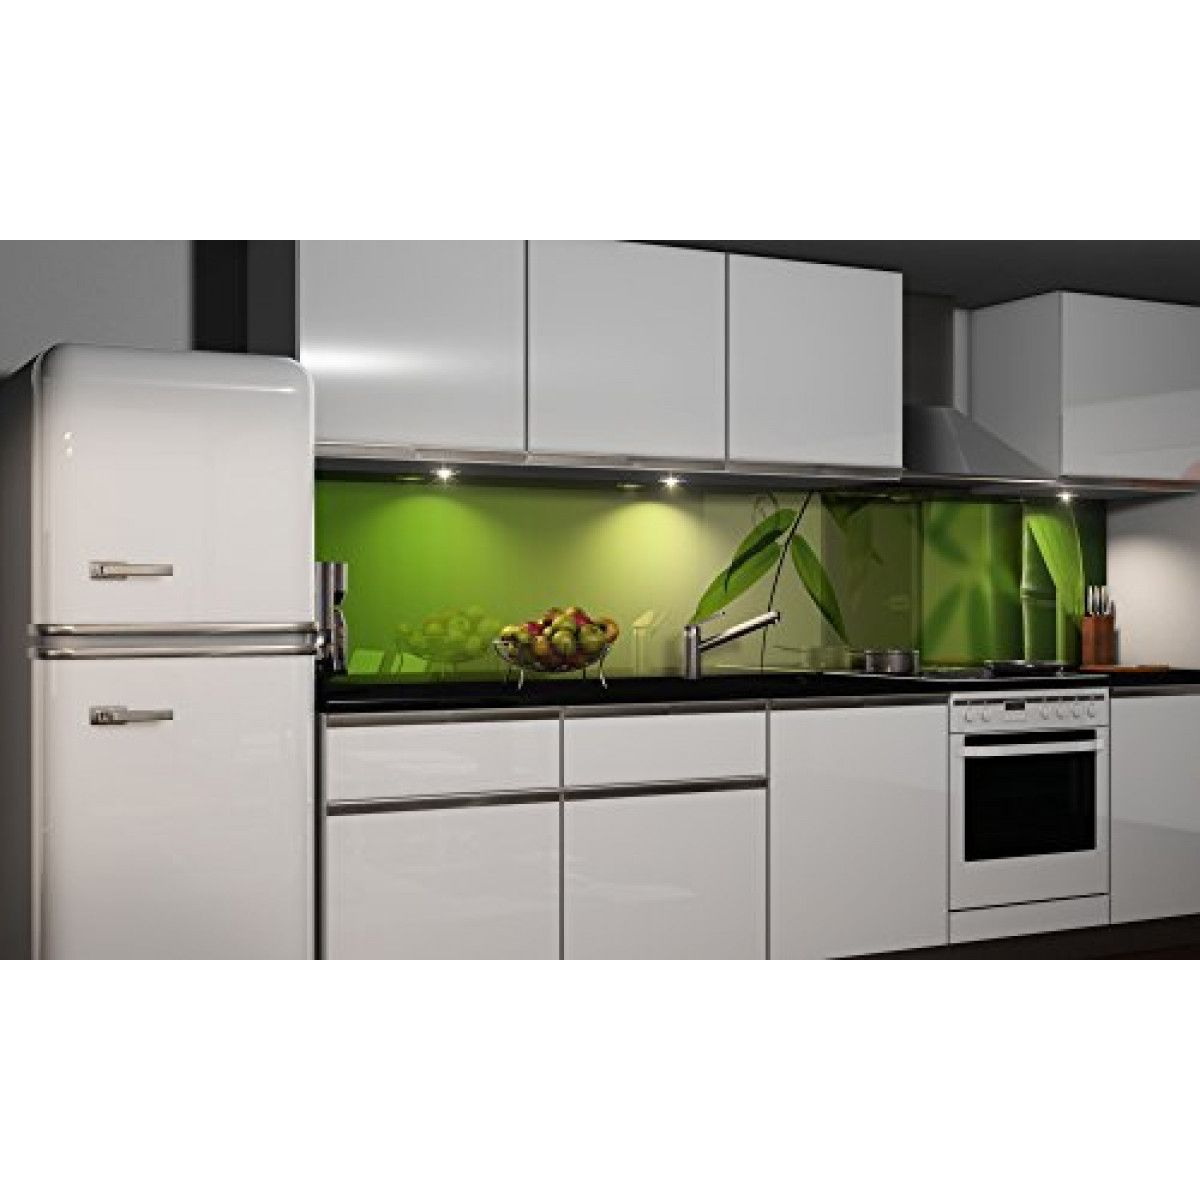 küchenrückwand folie new küchenrückwand folie selbstklebend